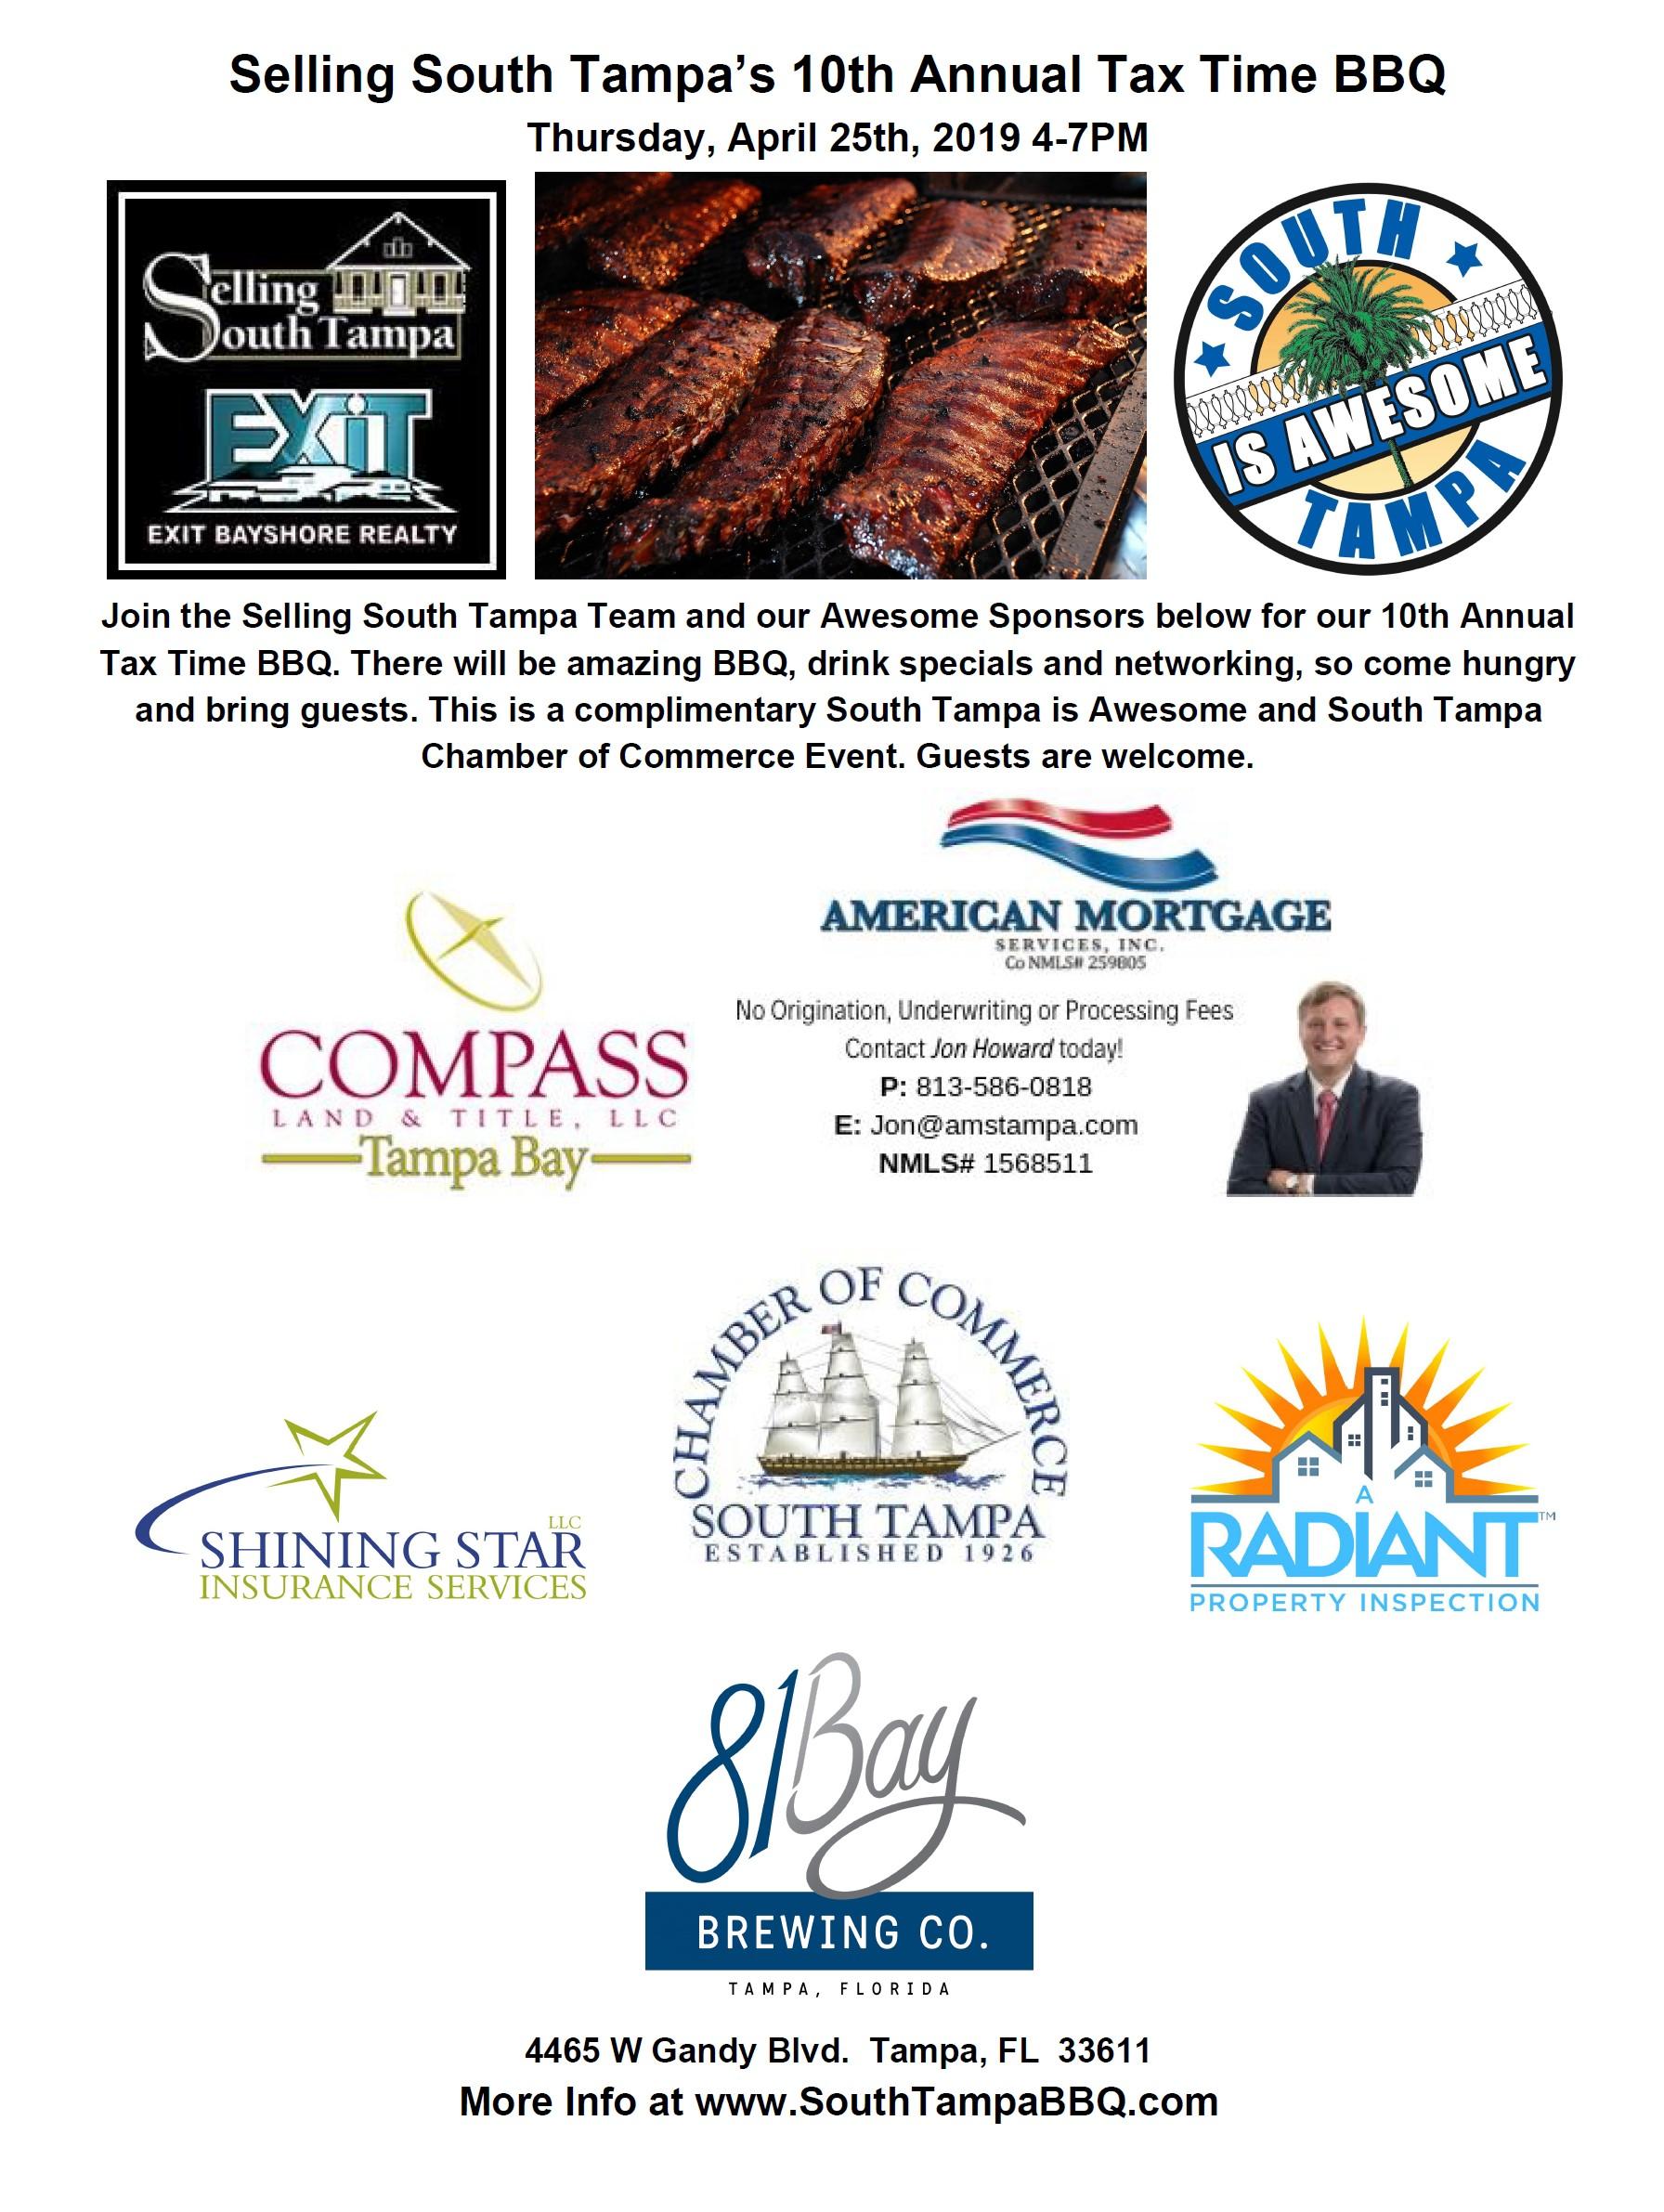 South Tampa BBQ